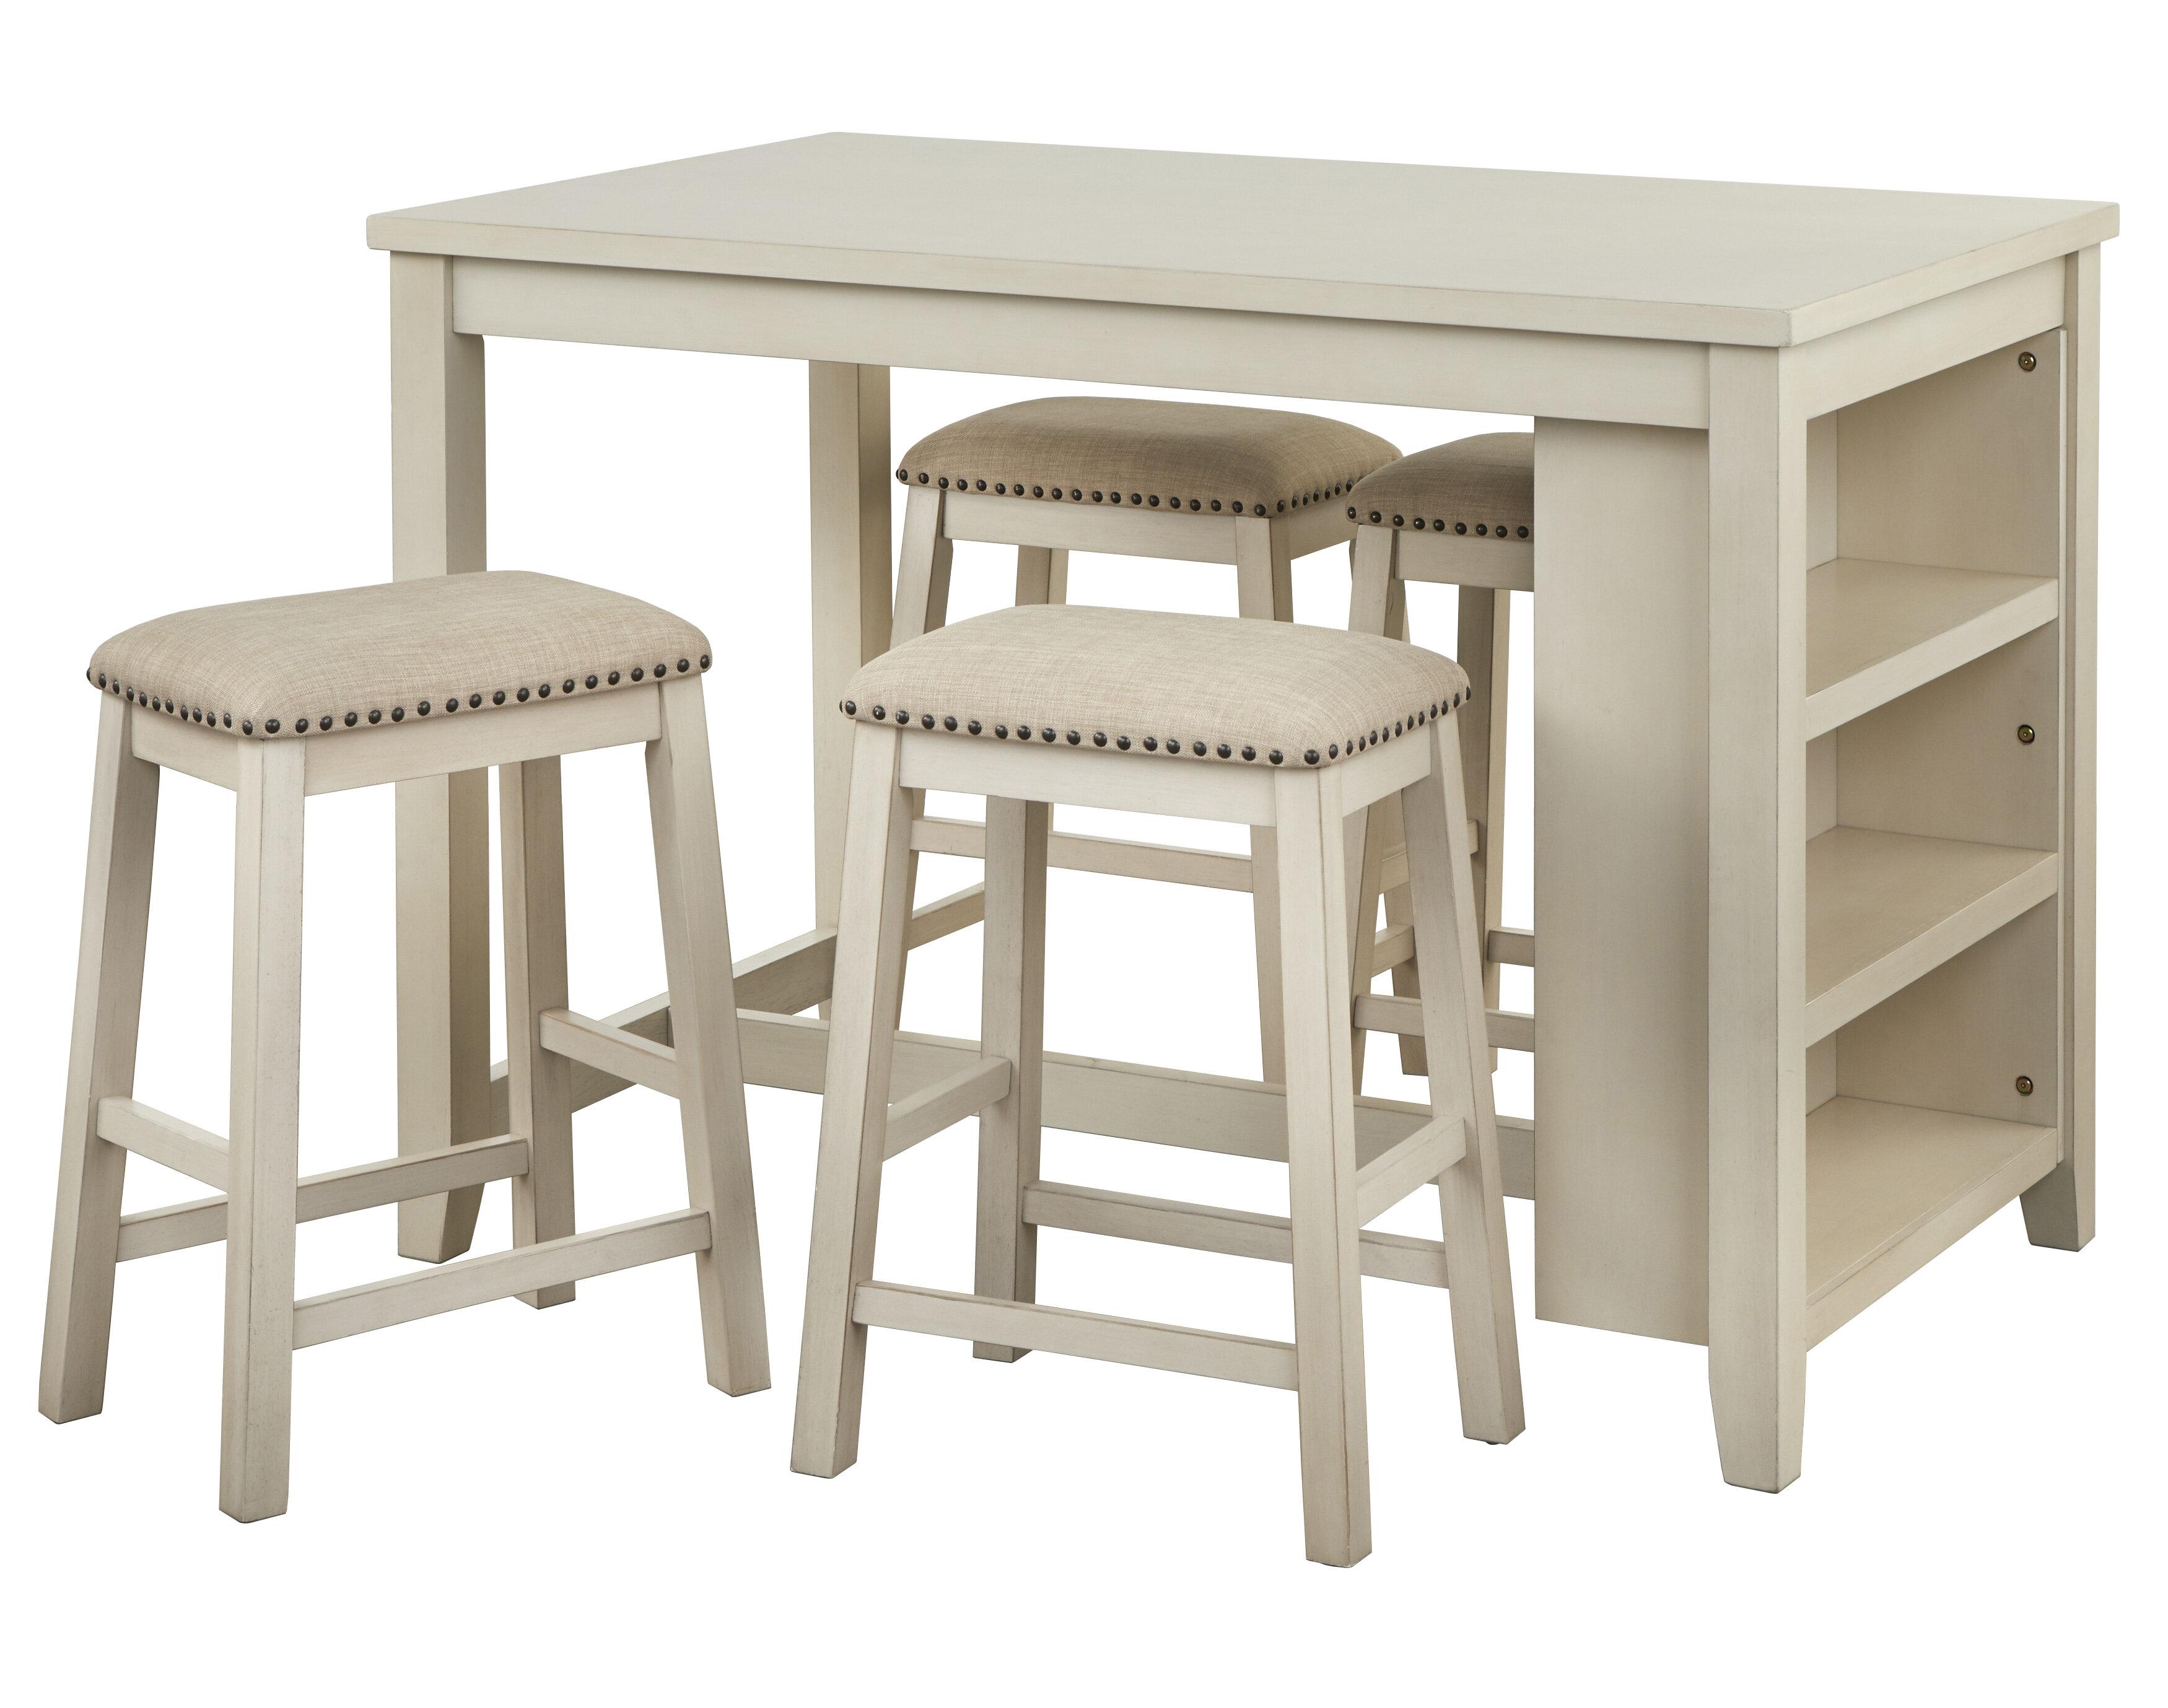 White Cane Outdoor Furniture, Winston Porter Dunbarton 5 Piece Counter Height Dining Set Reviews Wayfair